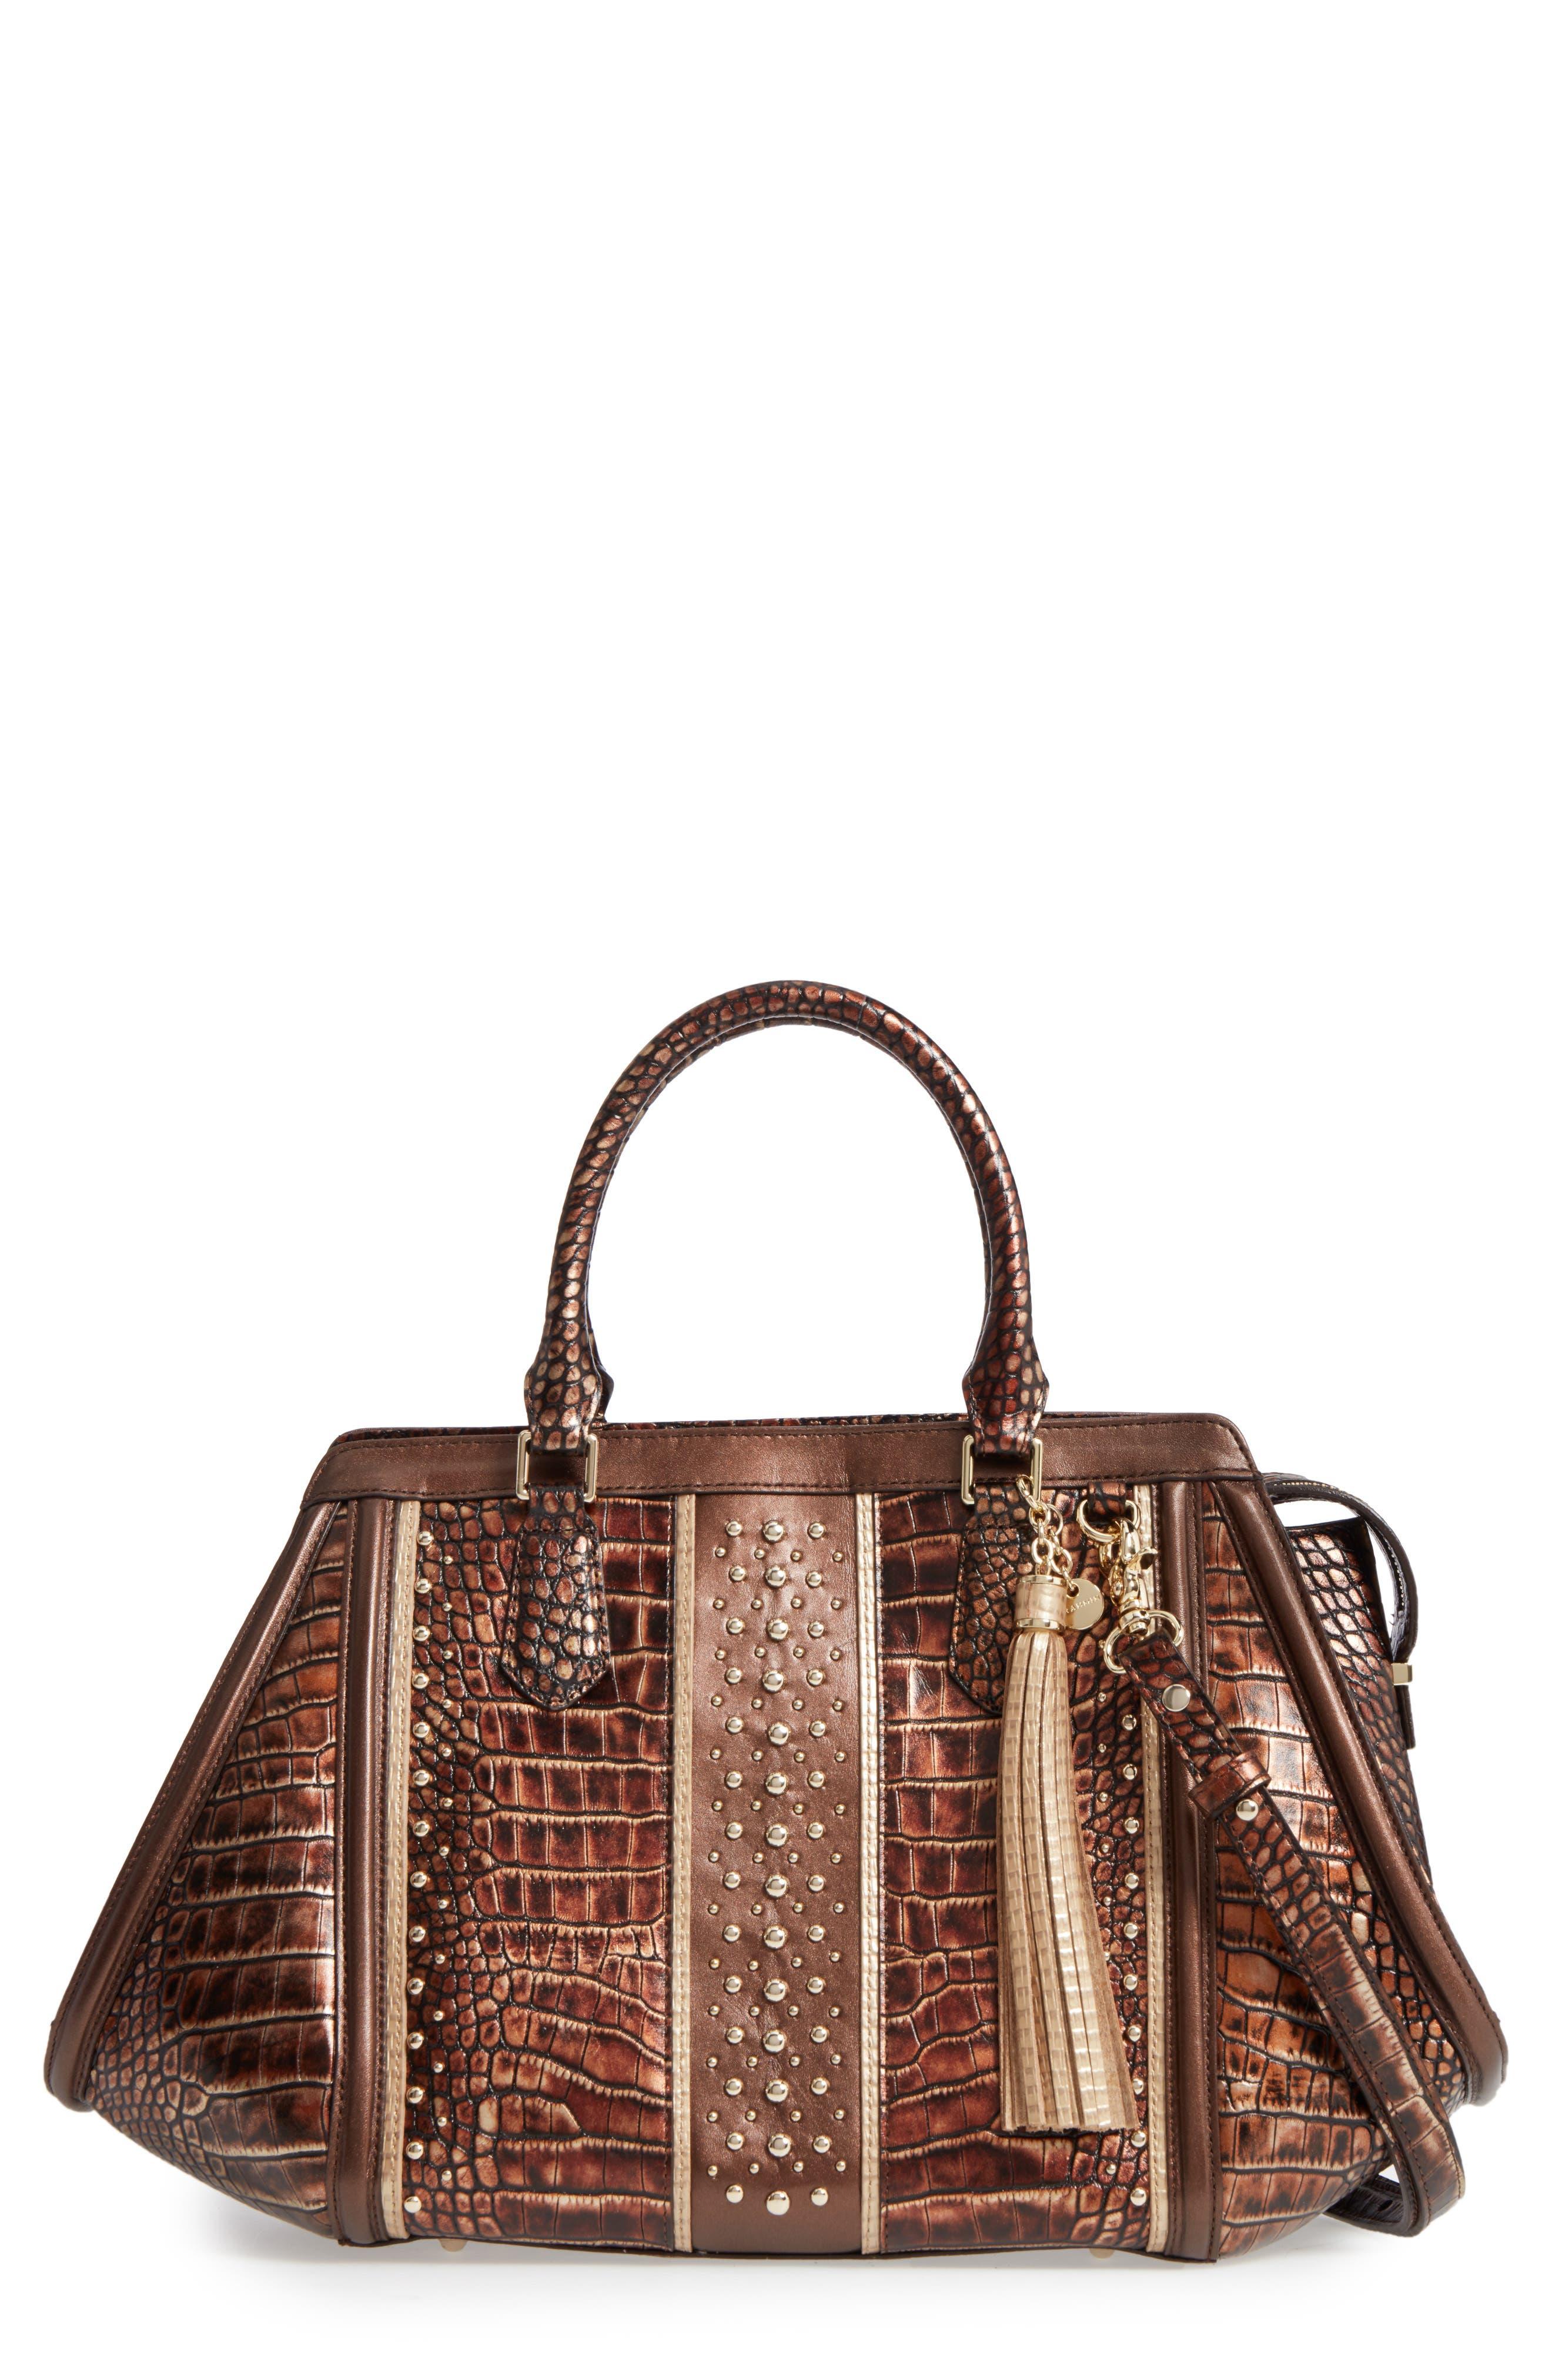 Main Image - Brahmin Milan Arden Embossed Leather Satchel